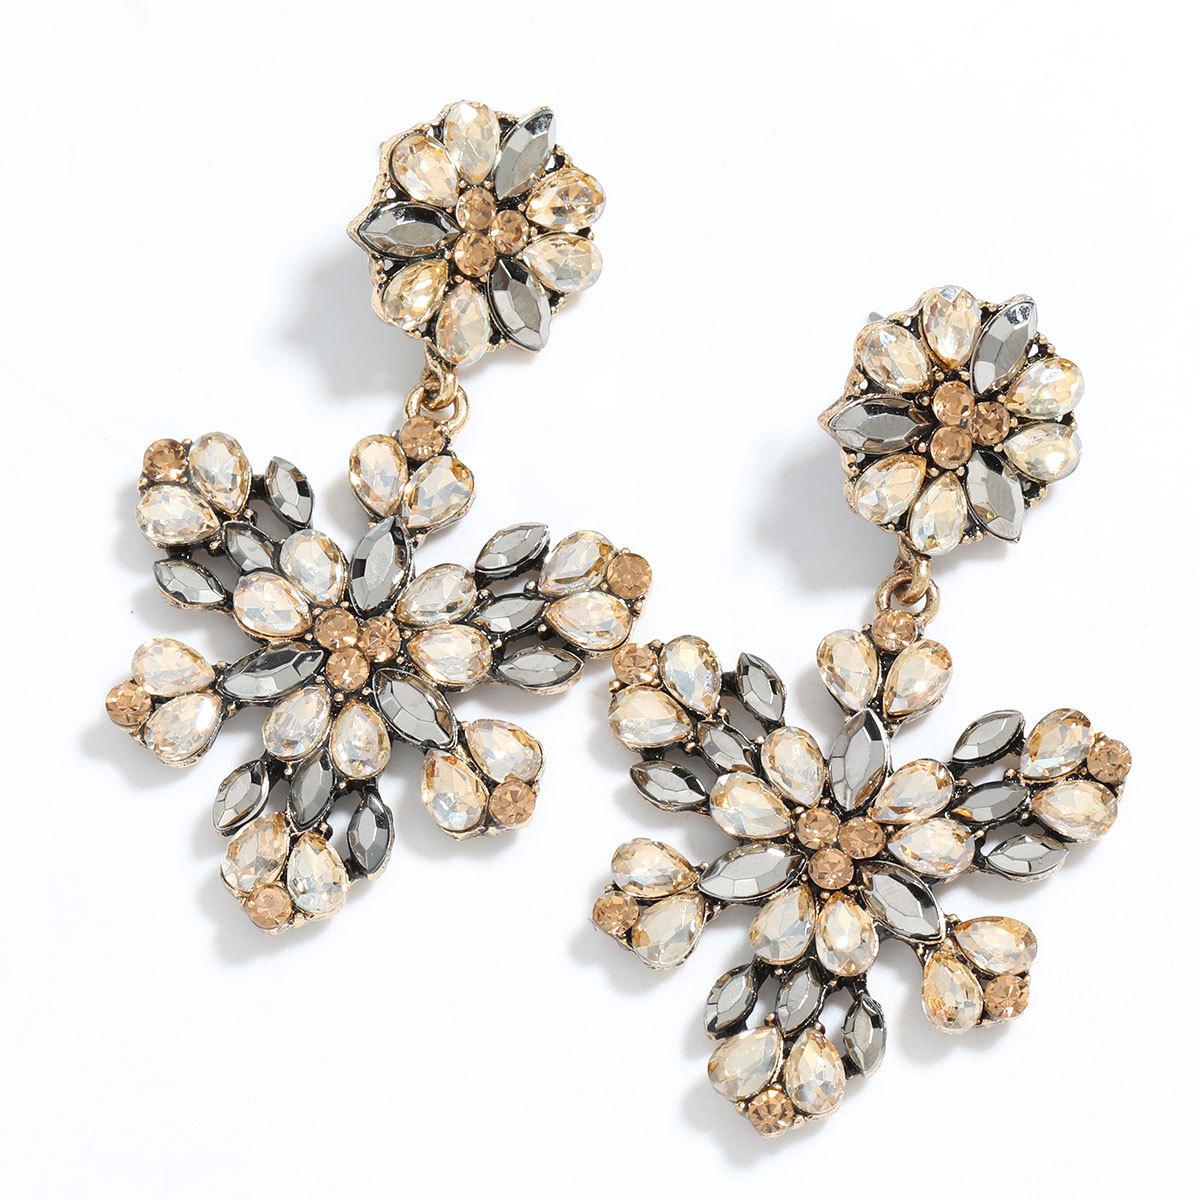 Boucles d39oreilles de fleurs en strass en alliage multicouche en alliage multicouche de srie de diamants de couleur de mode en gros nihaojewelry NHJE241397